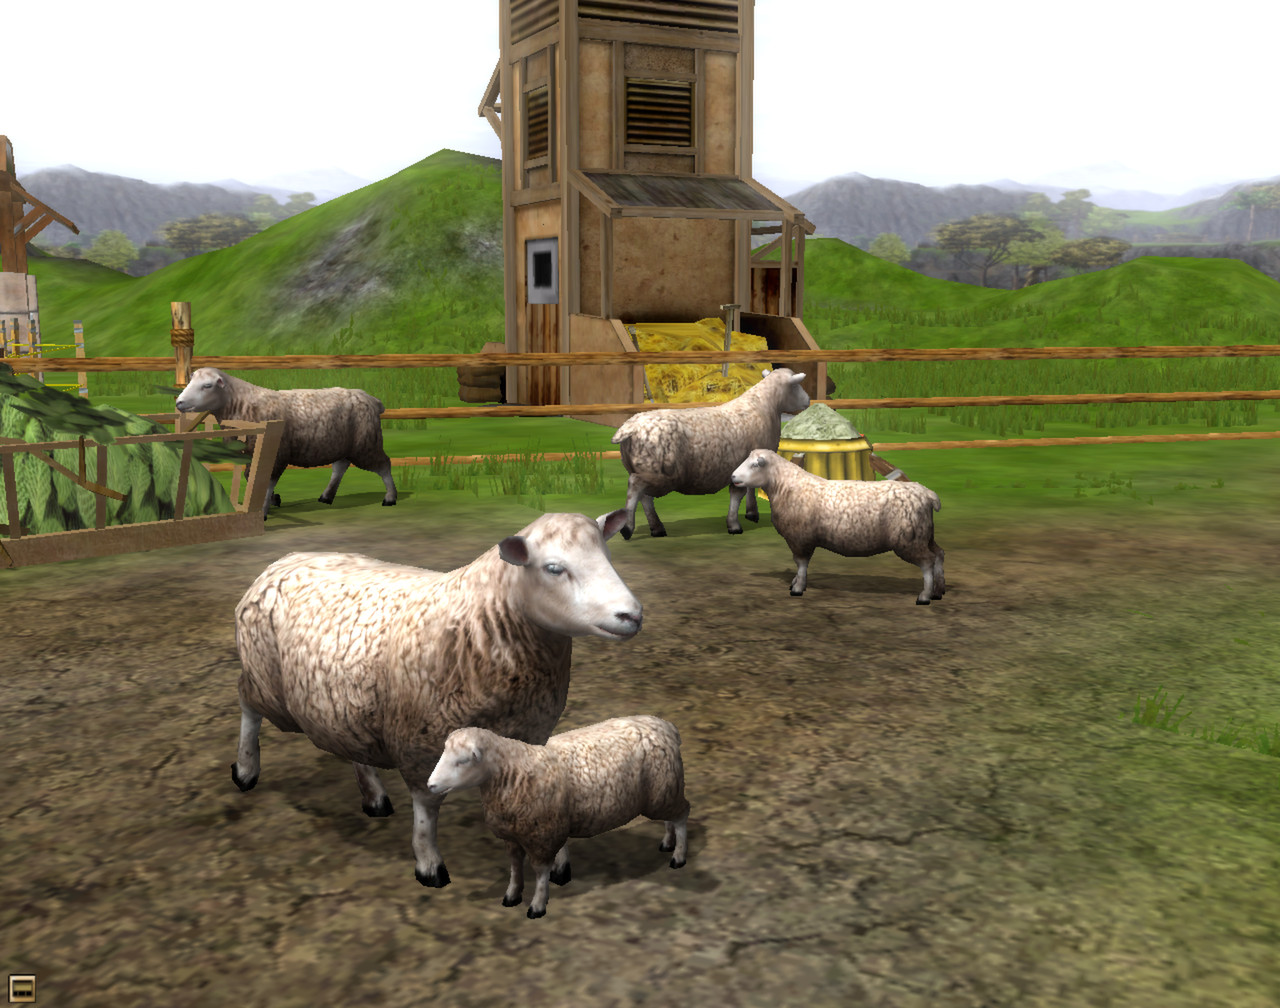 Wildlife Park 2 - Farm World screenshot